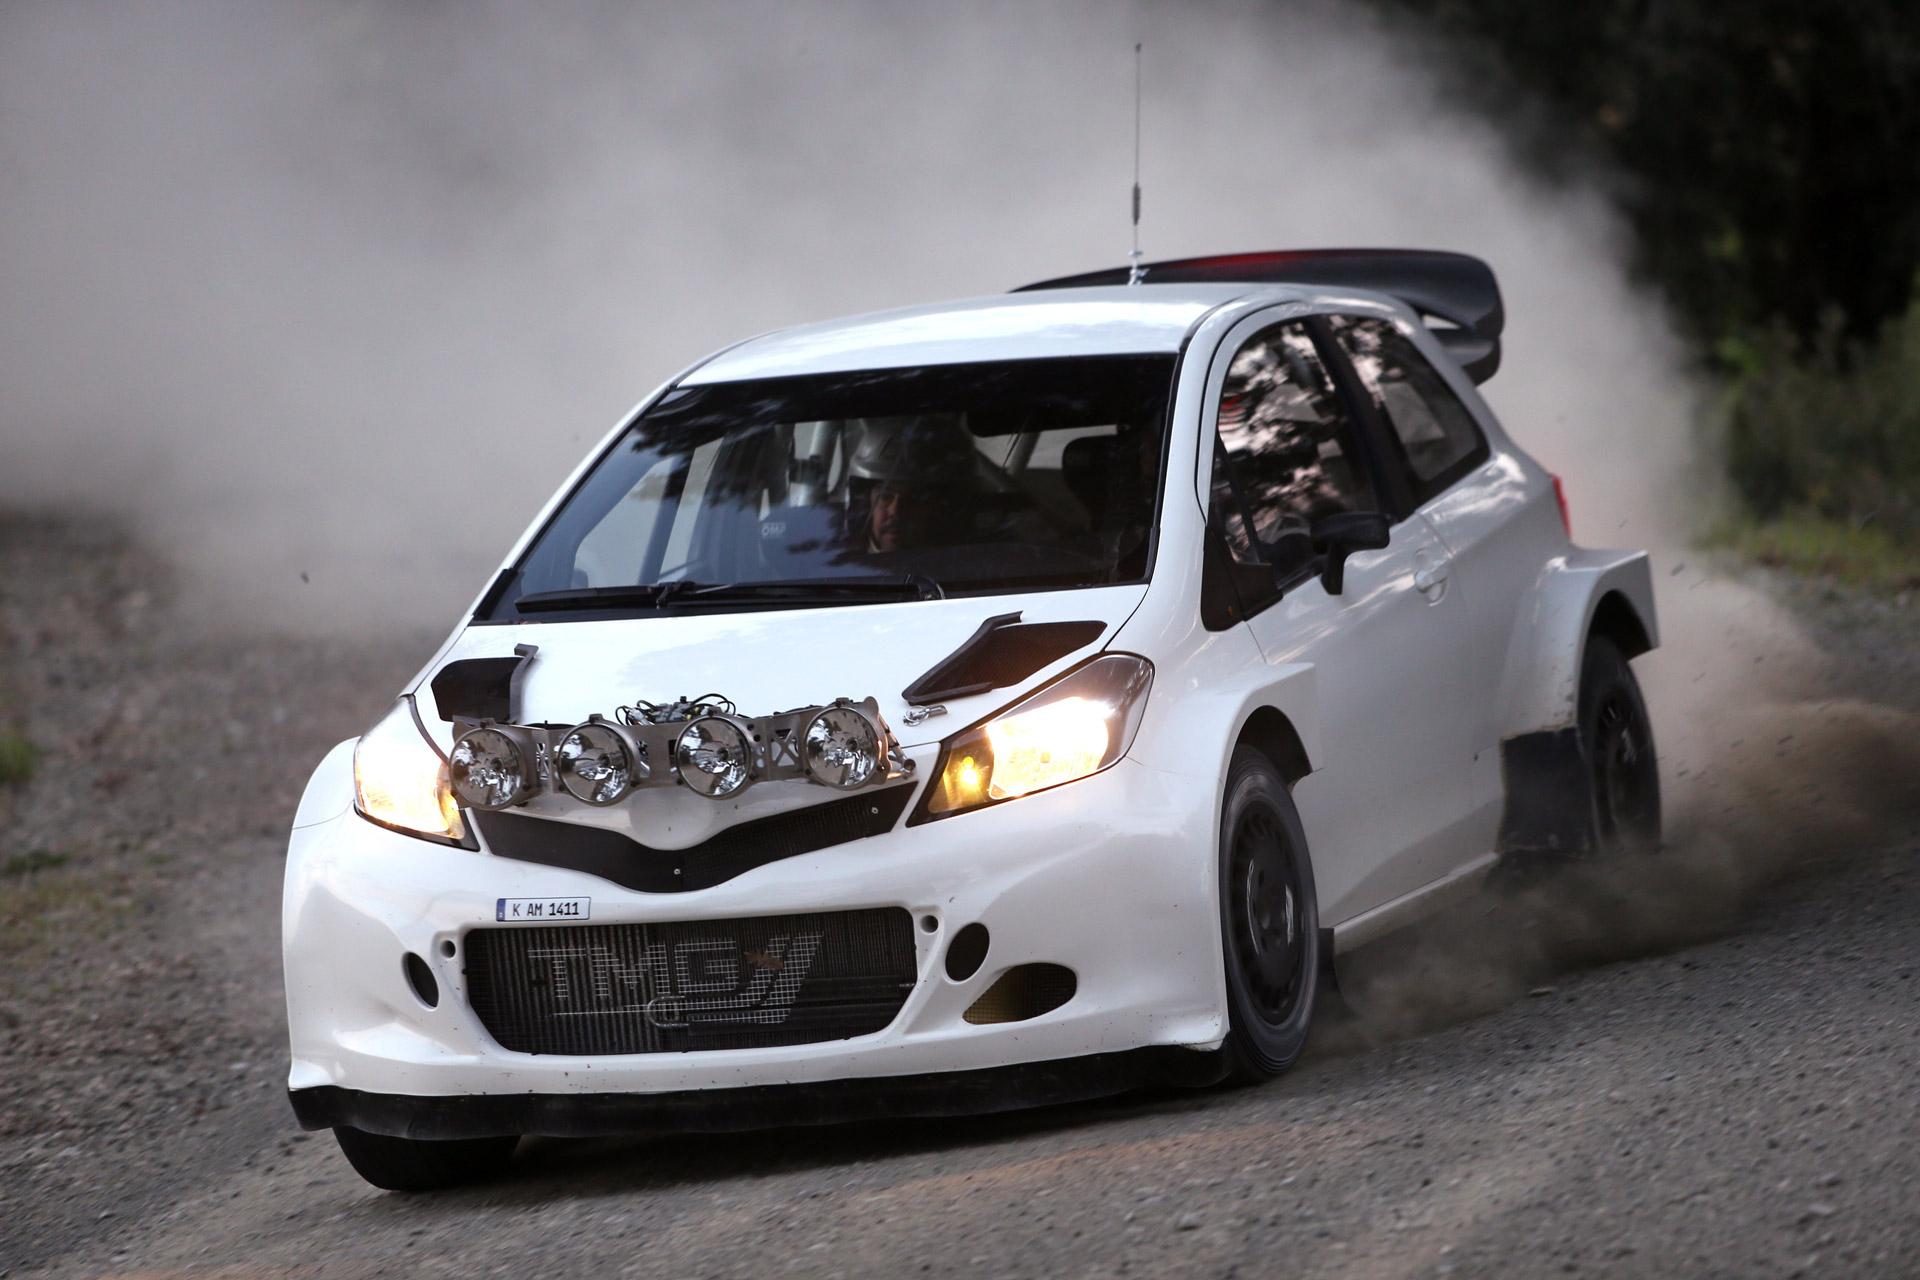 Rally Legend Tommi Mäkinen To Lead Toyota's 2017 WRC Return